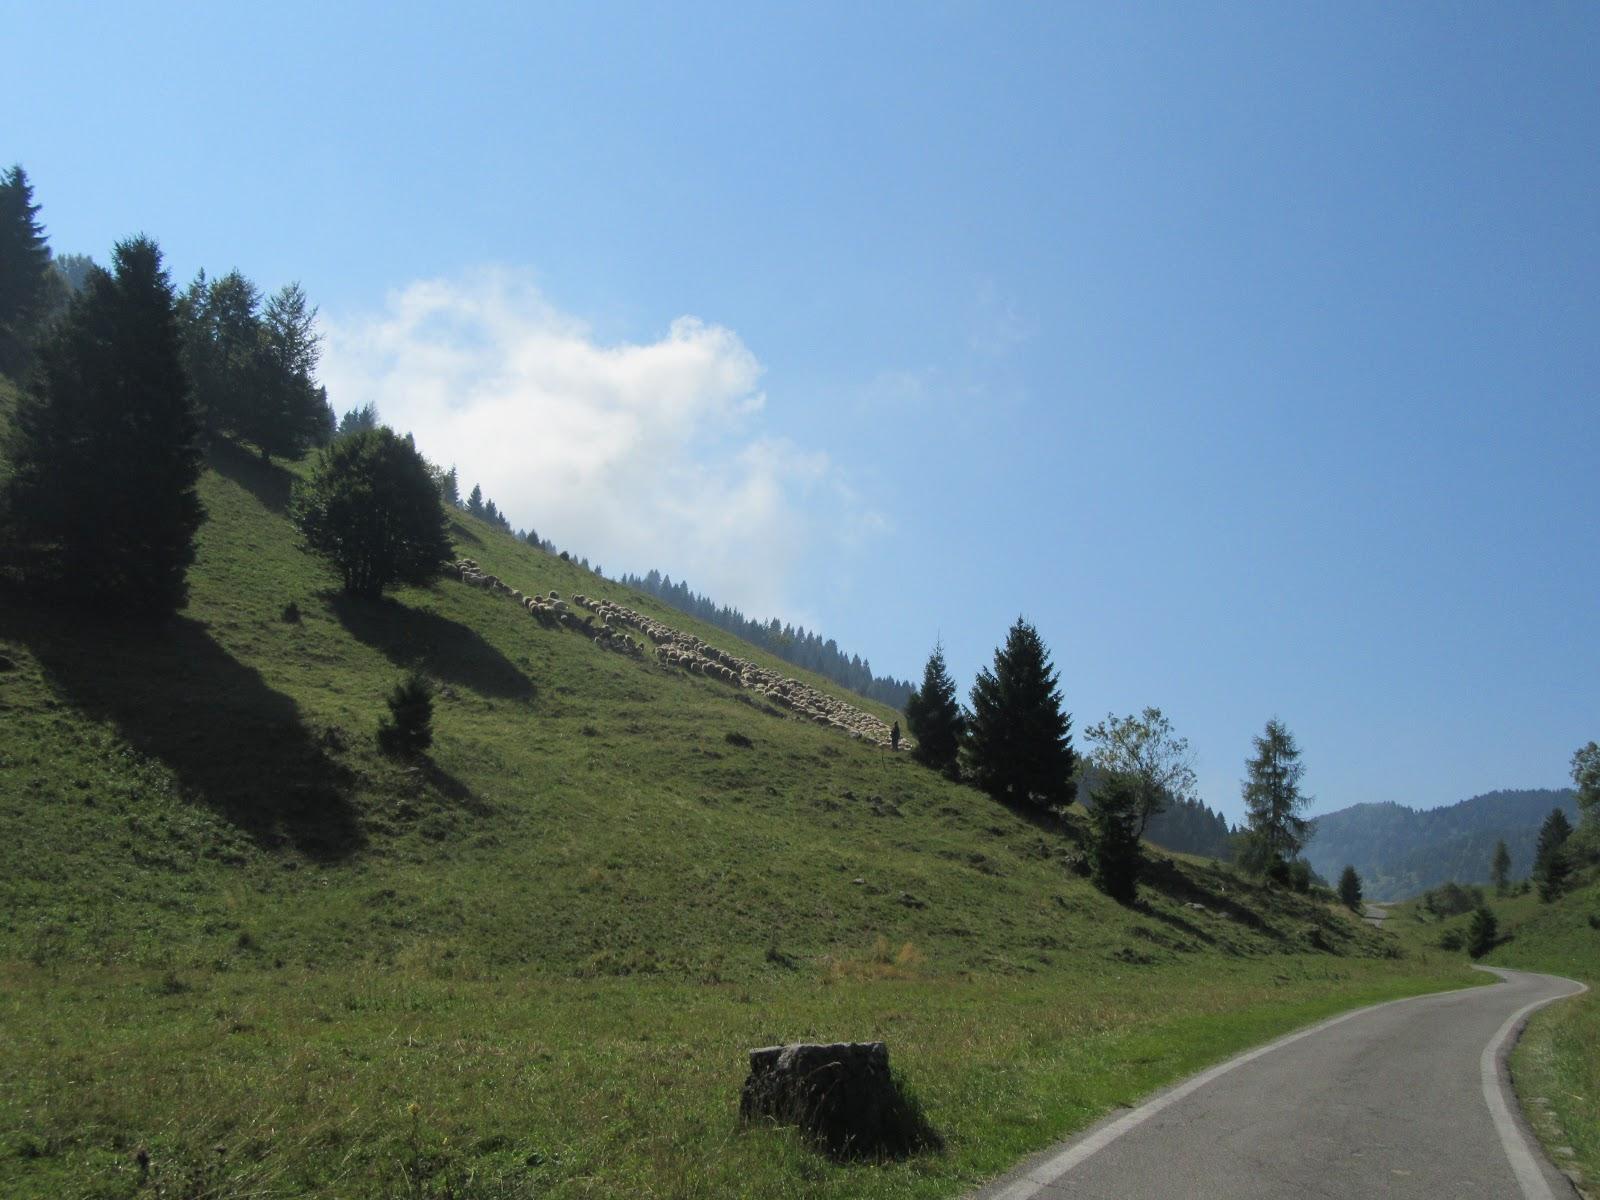 Climbing Monte Grappa from Possagno  by bike - grazing sheep near road